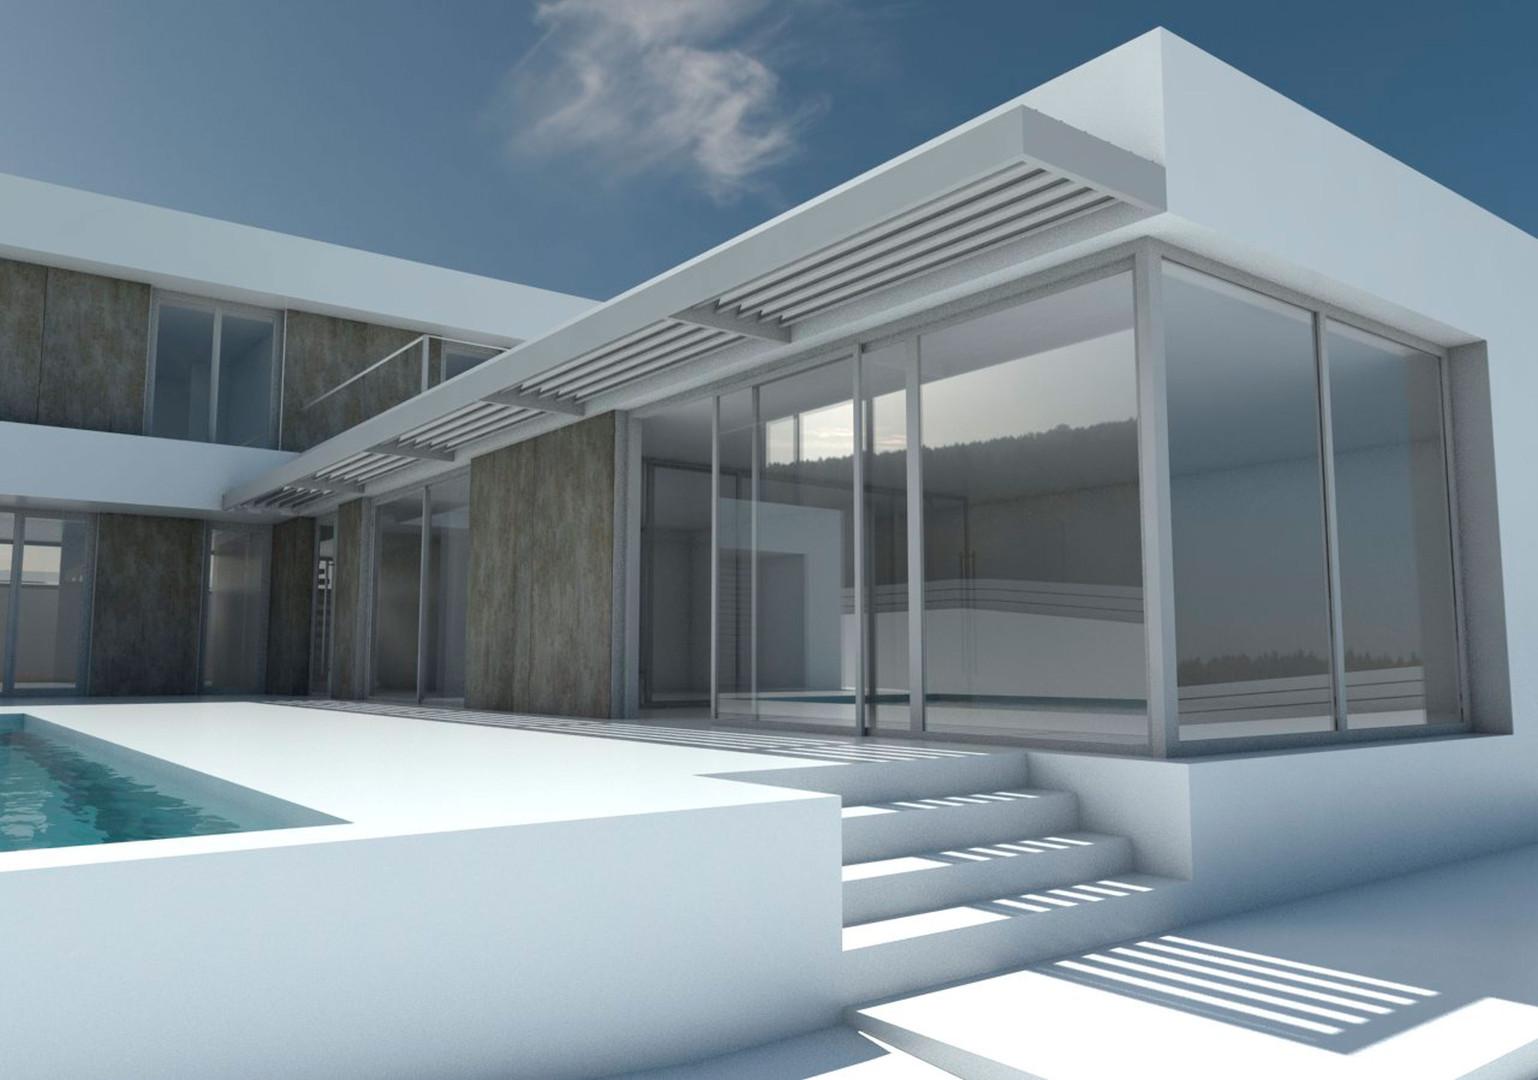 arquitectura-senmais-16.02.02.jpg